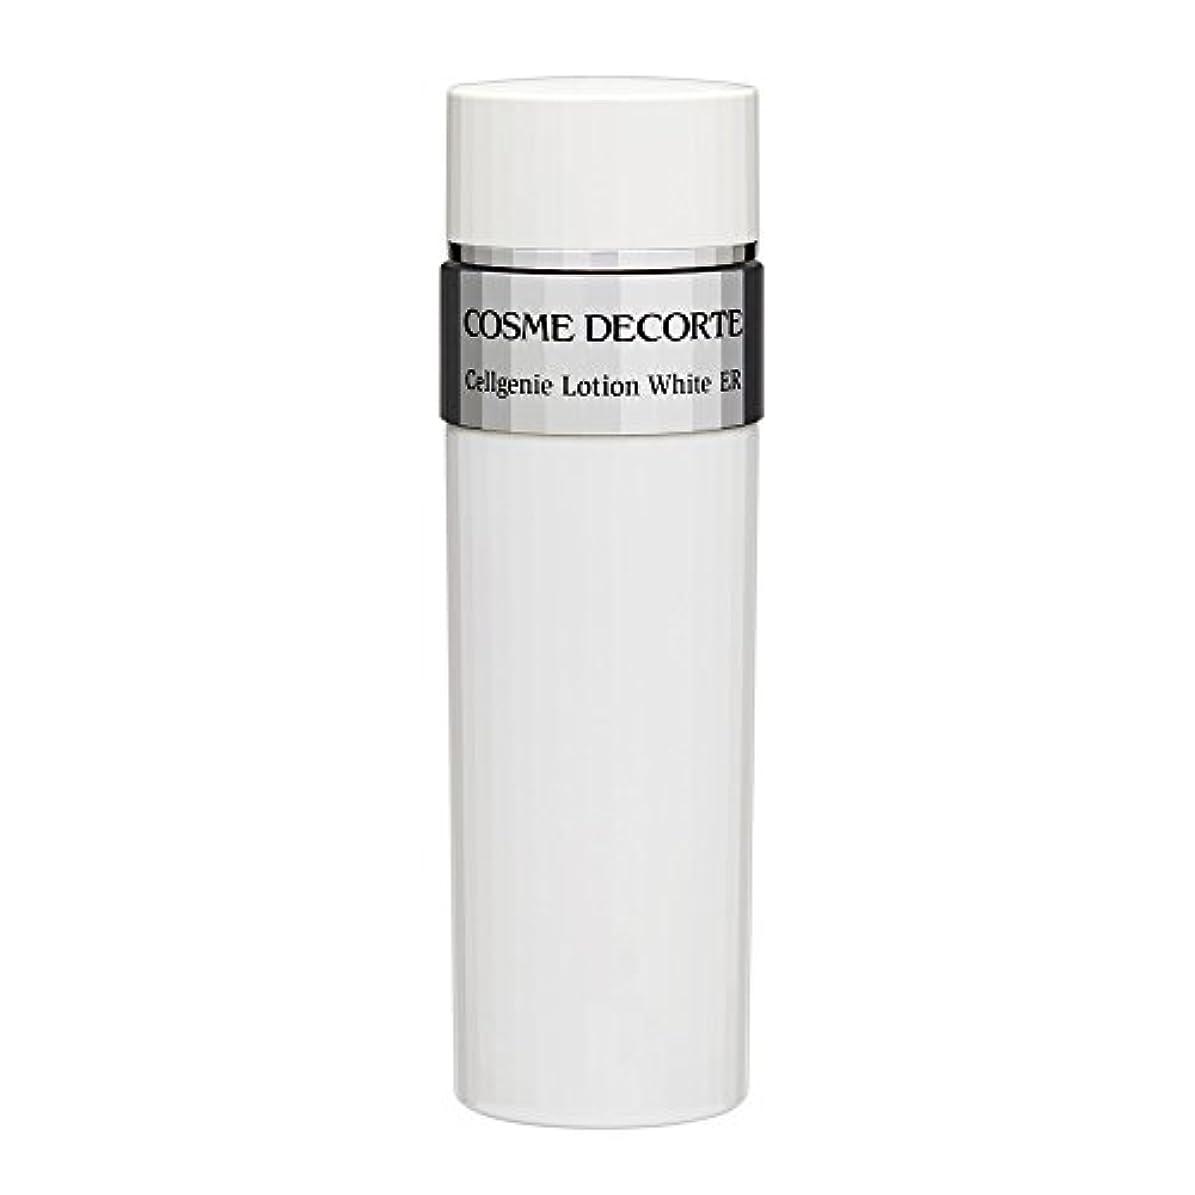 COSME DECORTE コーセー/KOSE セルジェニーローションホワイトER 200ml [362923] [並行輸入品]